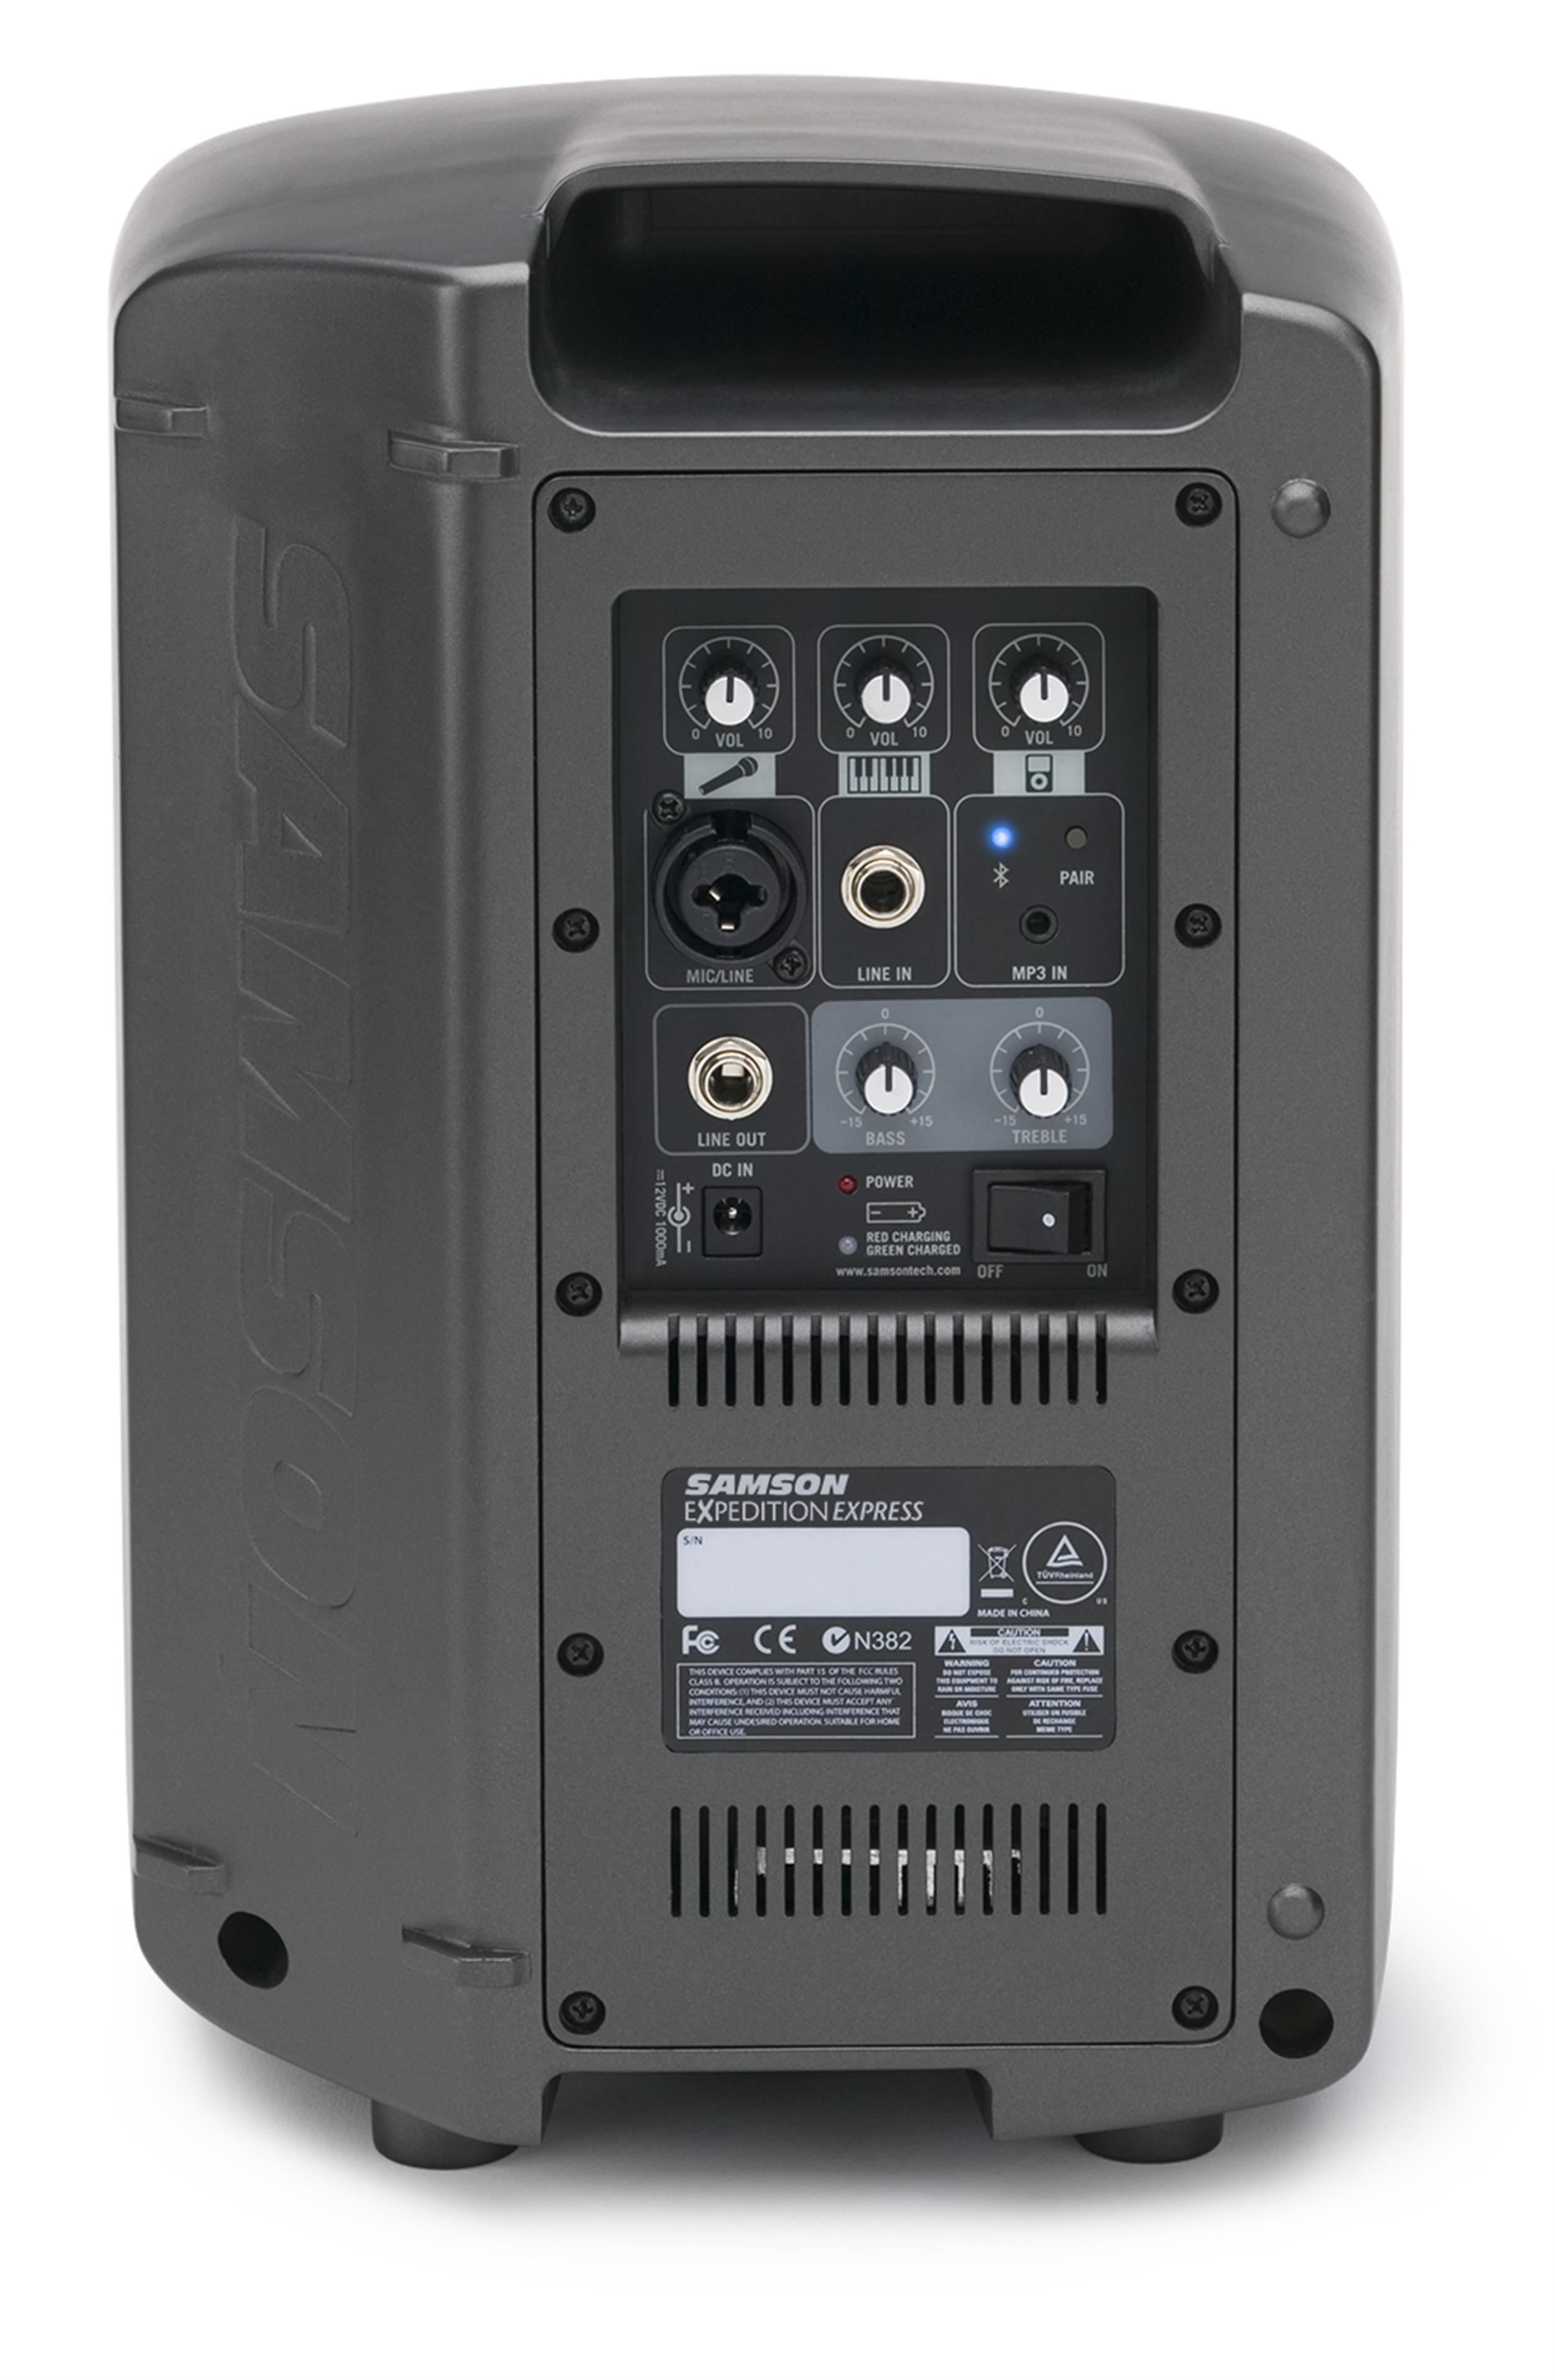 Samson EXPEDITION XP106 - PA Portatile con Bluetooth - 100W